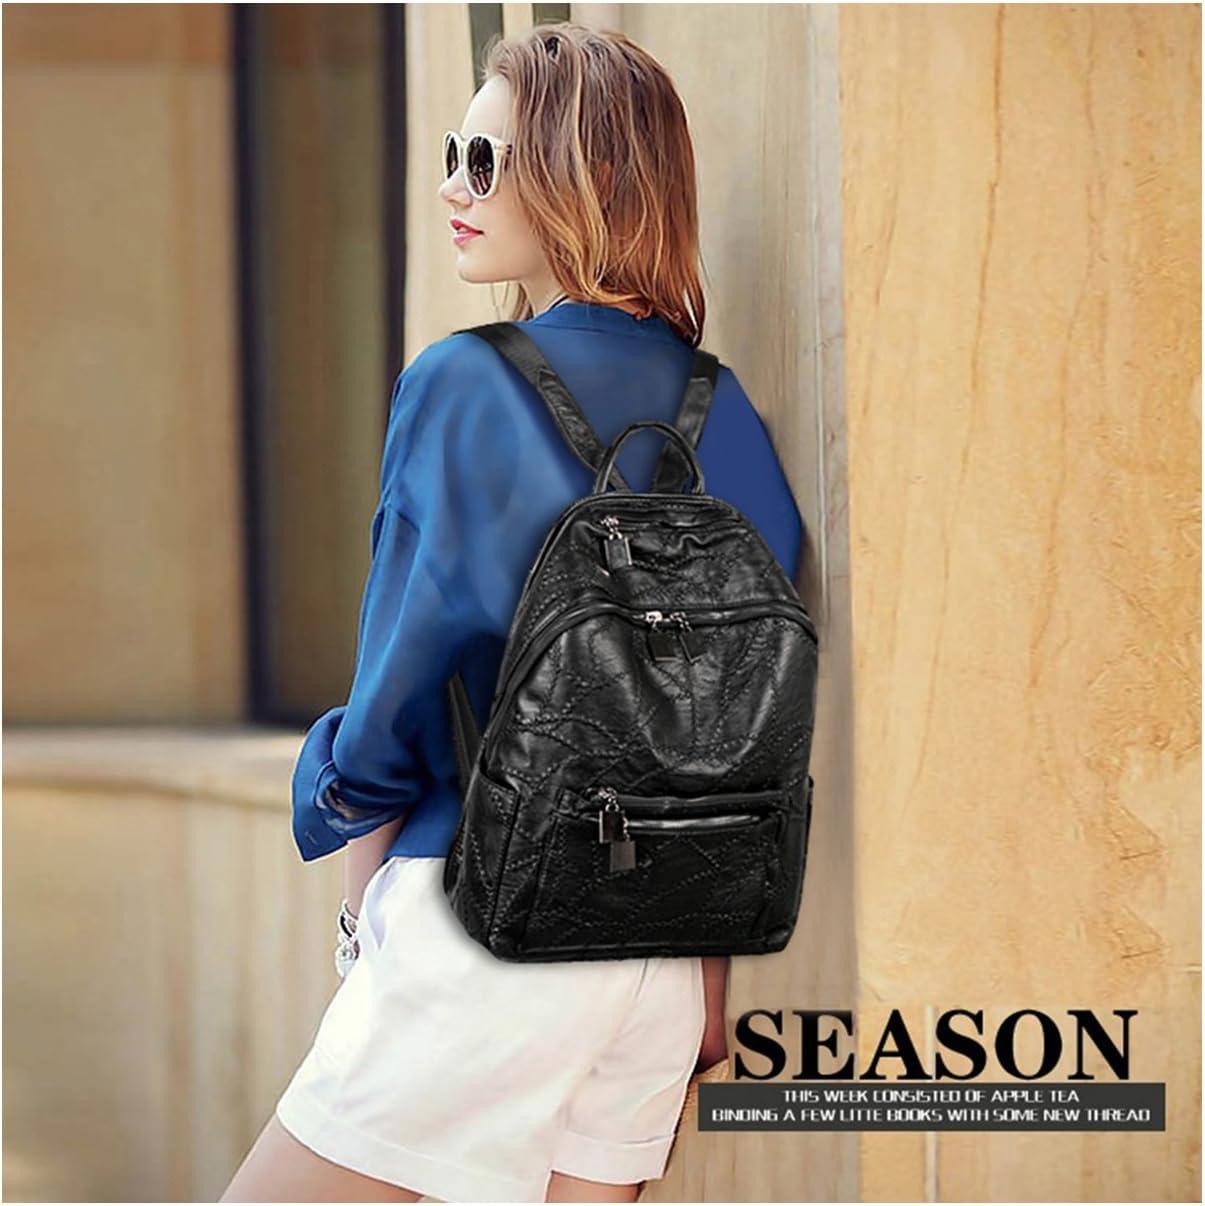 Backpack purse for women Black stitich leather knapsack shoulder bags for man